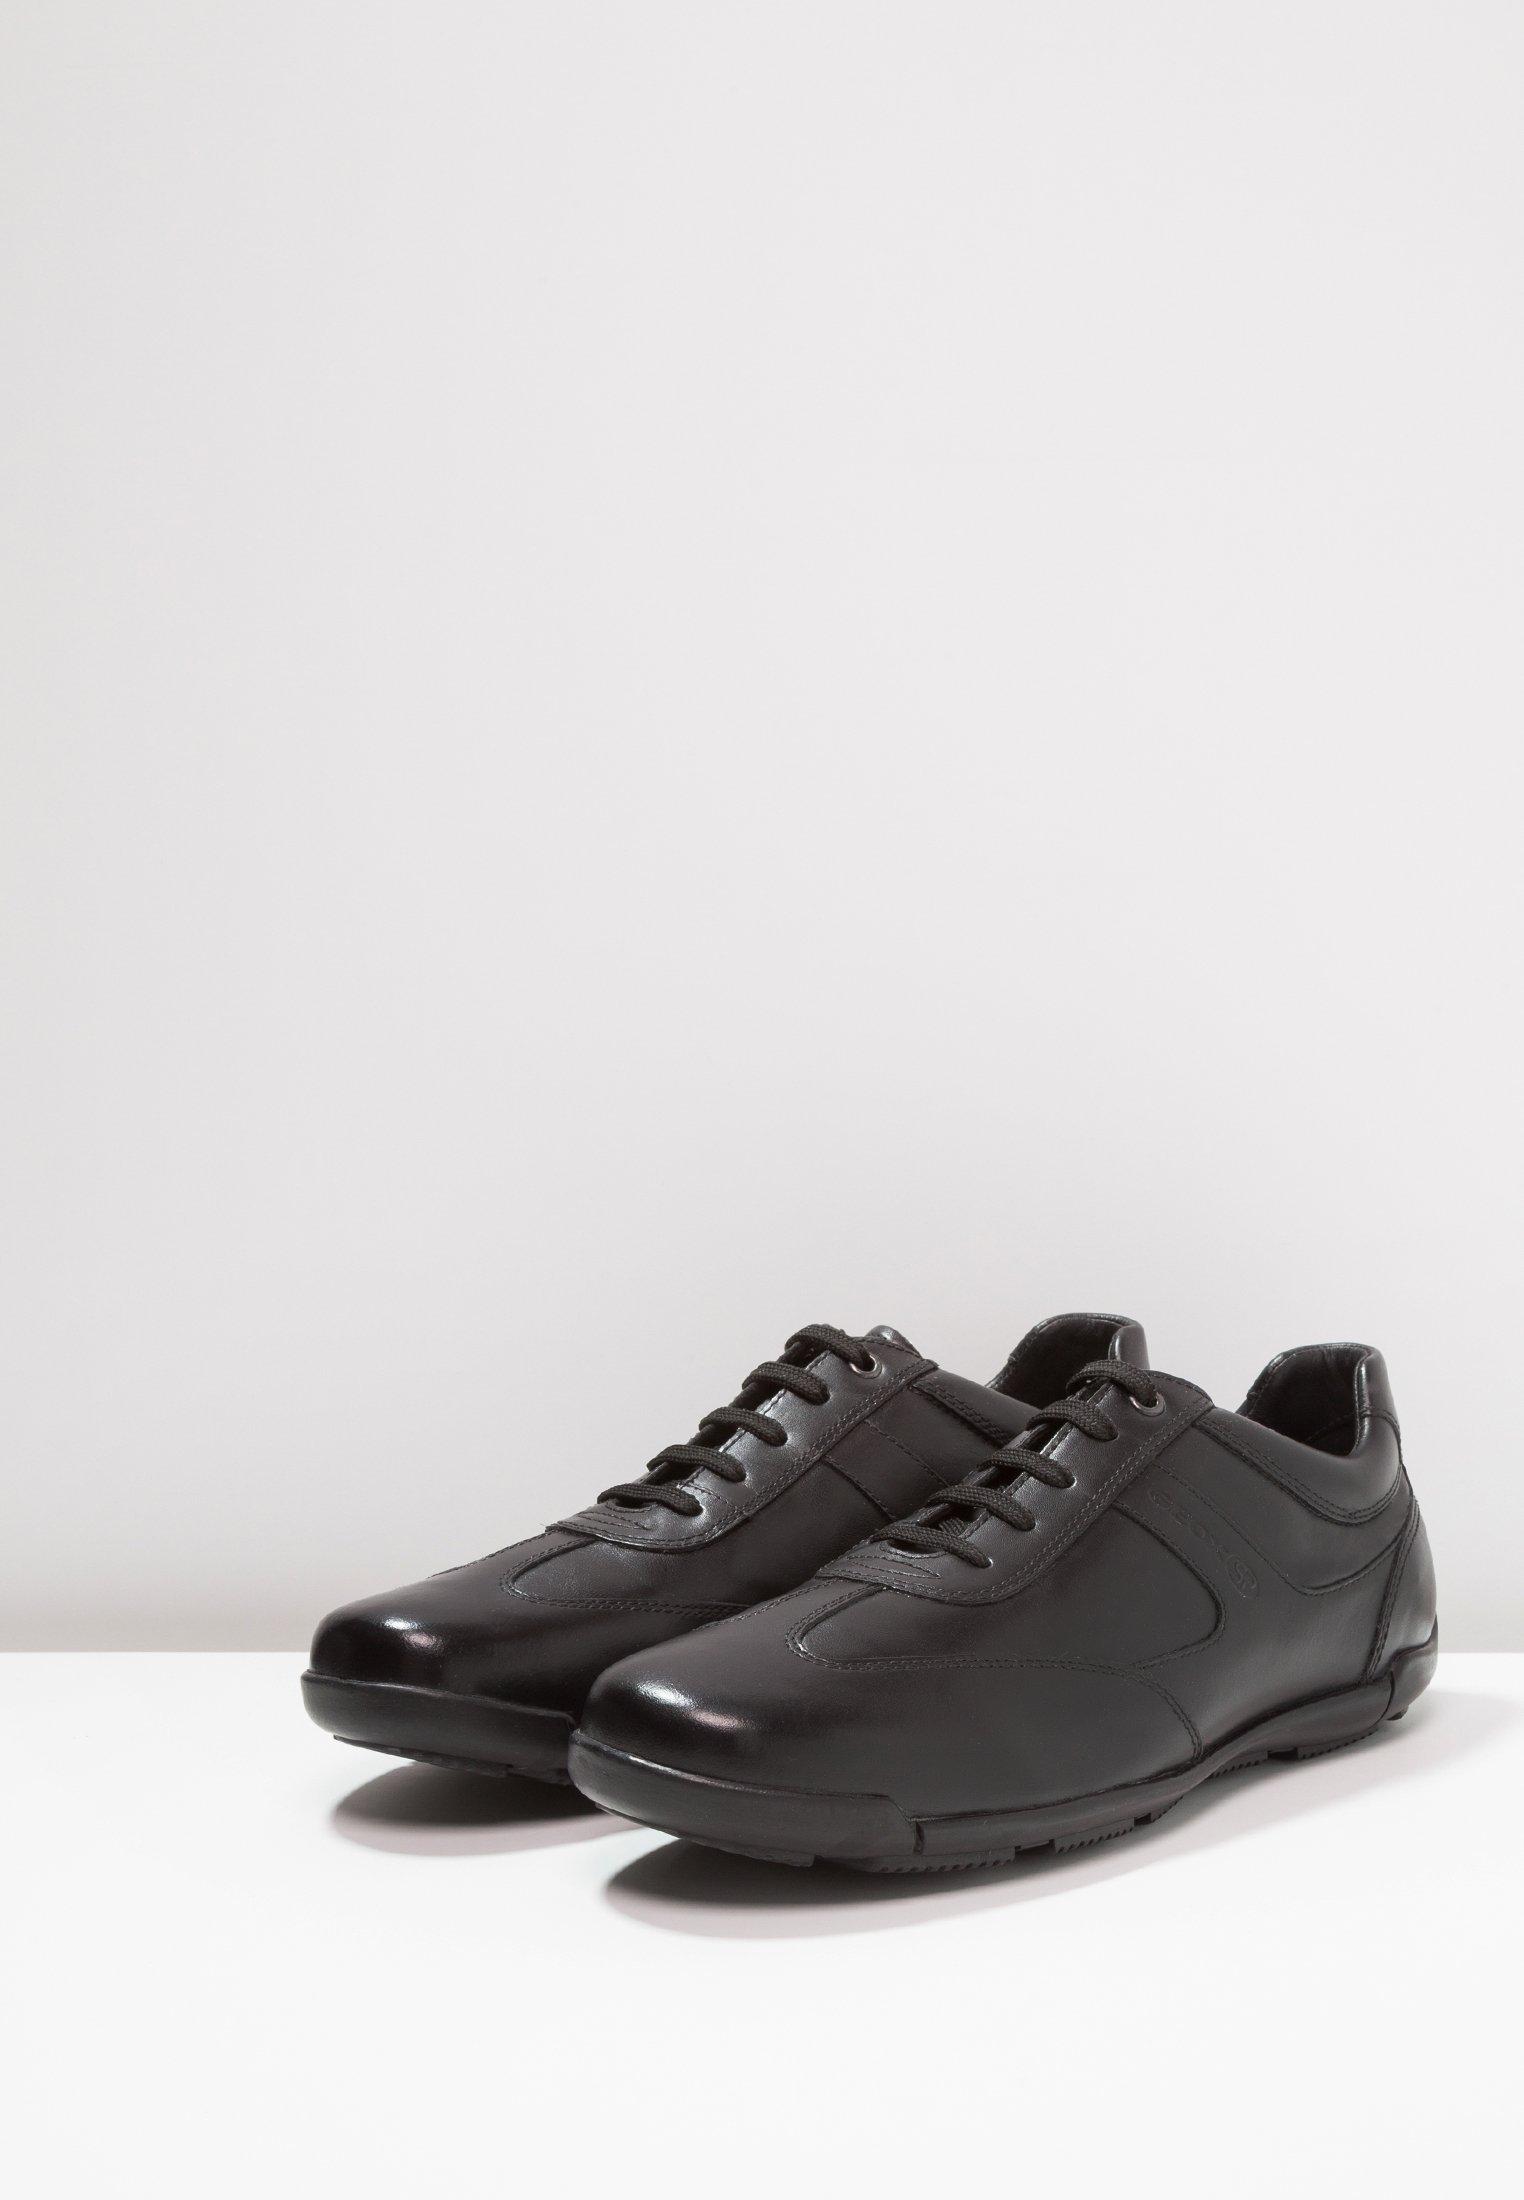 Geox EDGEWARE - Baskets basses black